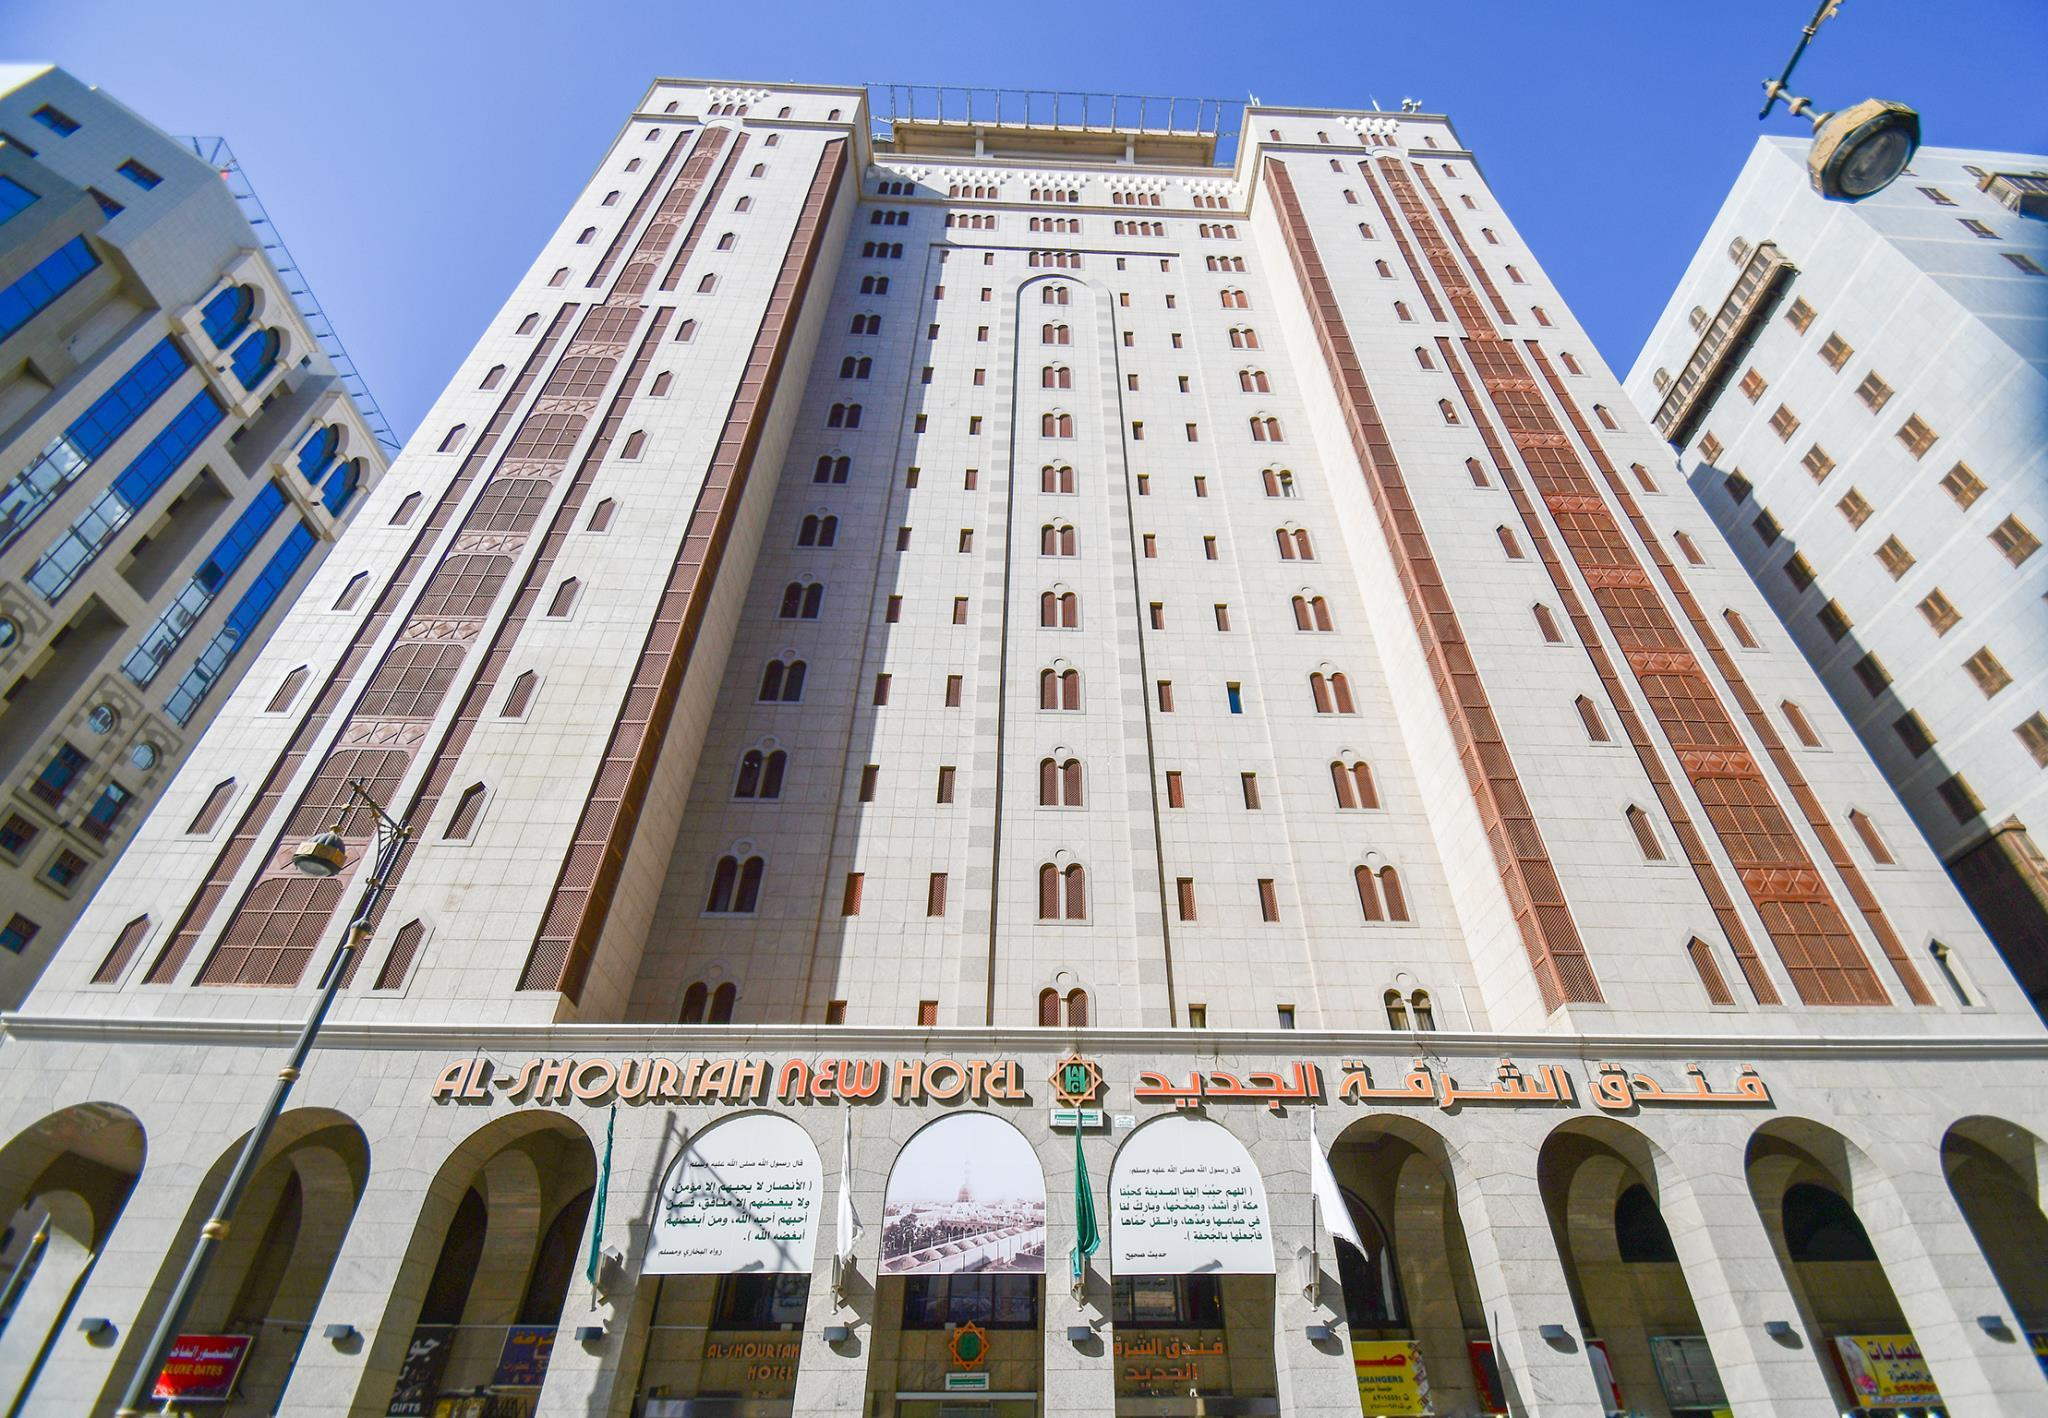 Al Shourfah Hotel Madinah